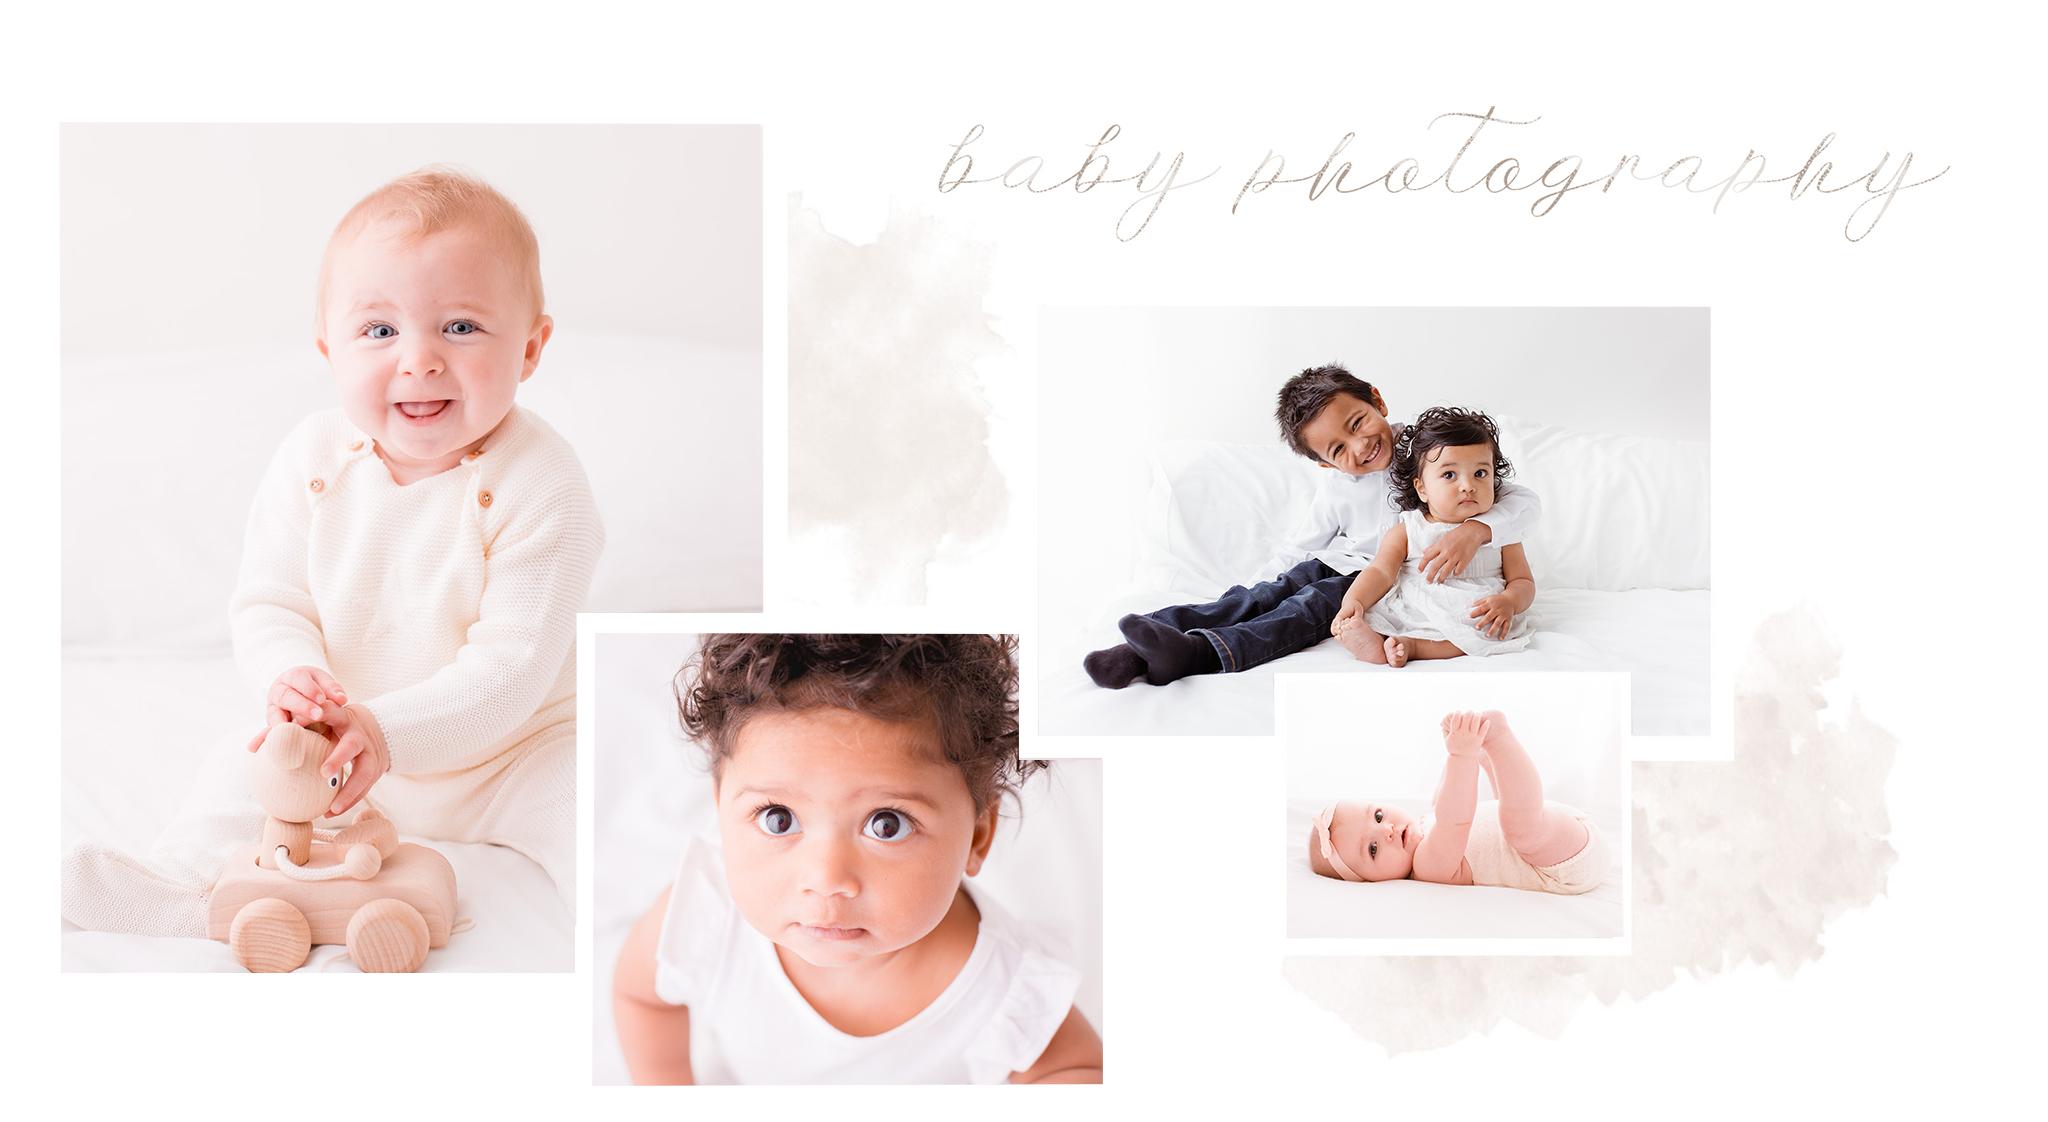 beautifullittlemoments-baby-photography-homepage-image4